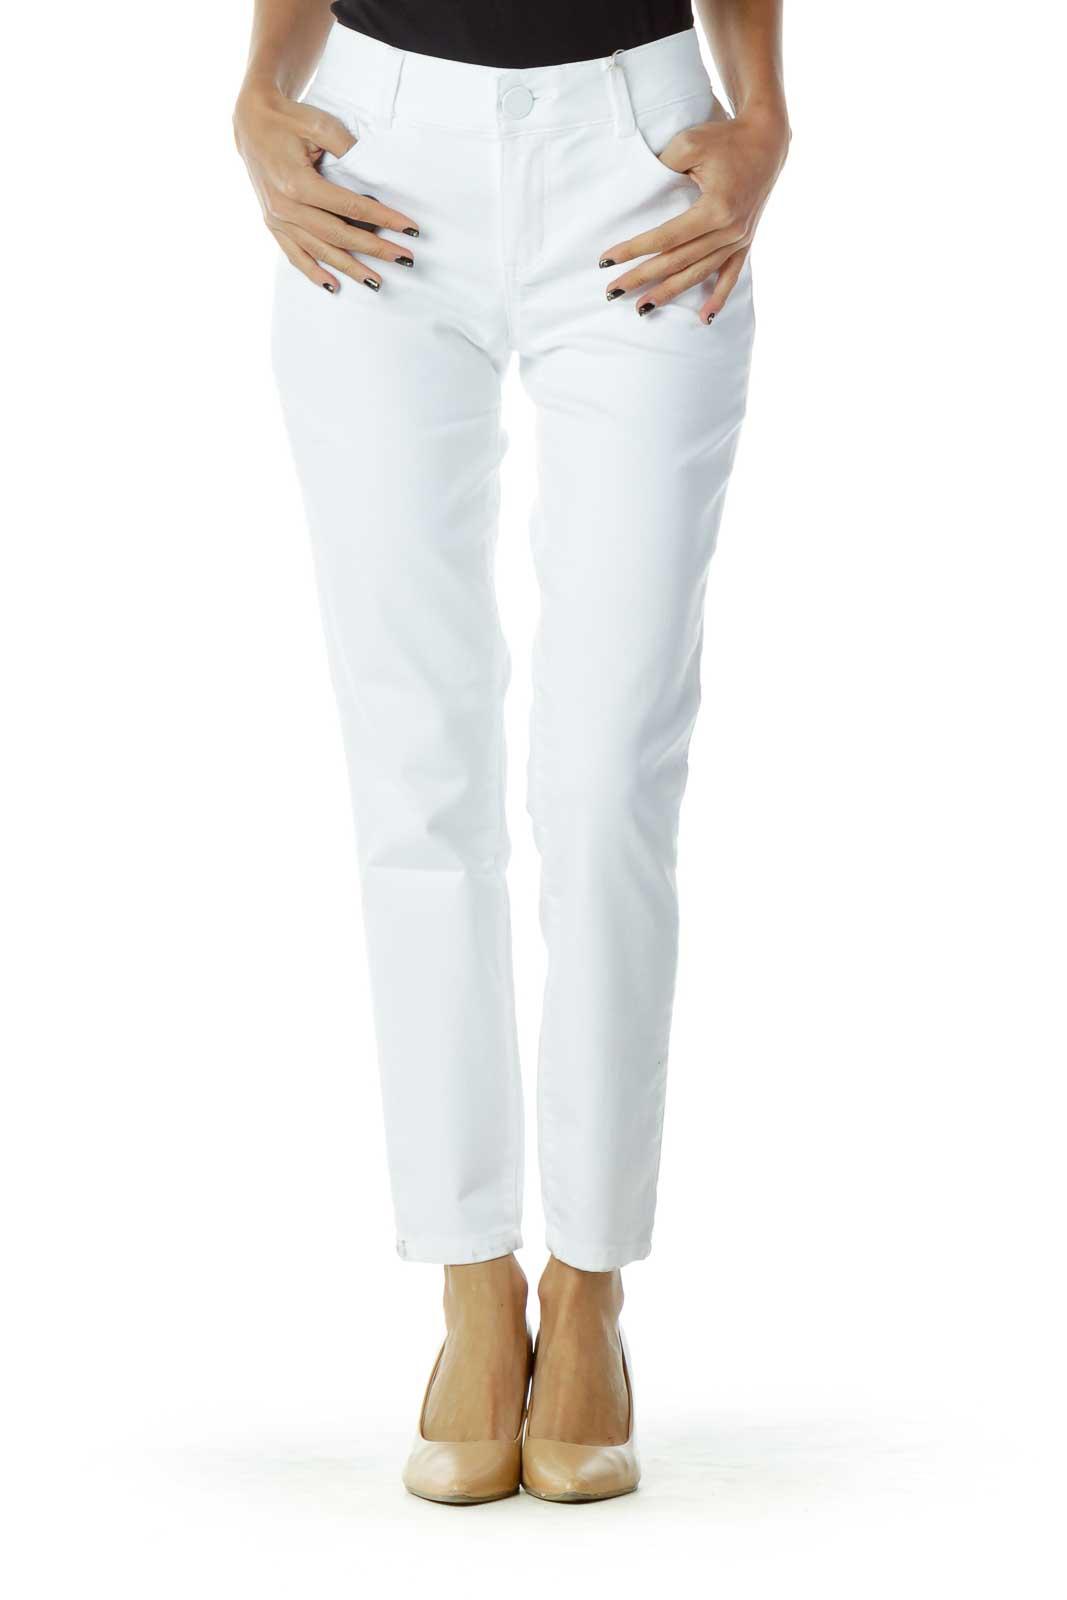 White Straight-Leg Jeans Front